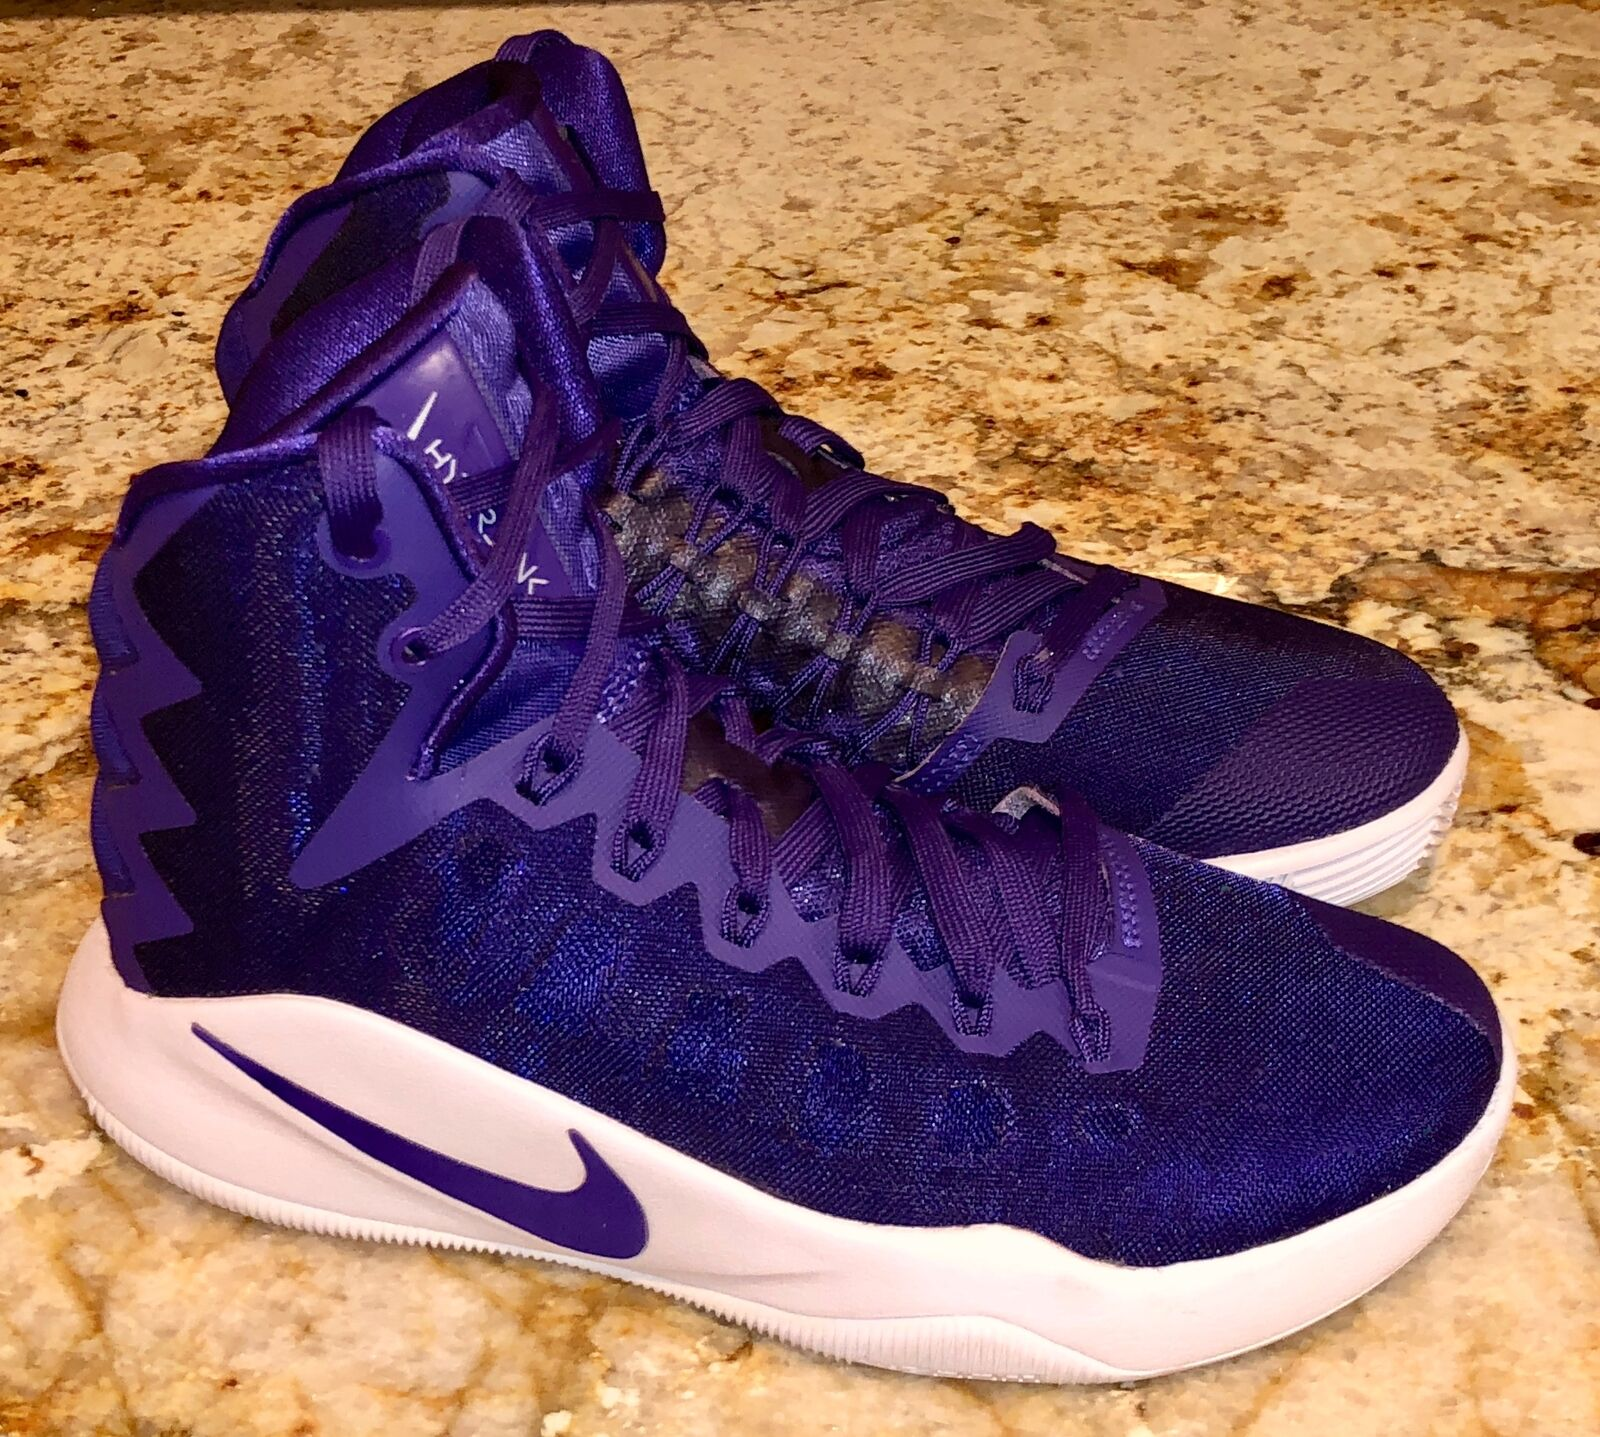 NIKE Hyperdunk 2016 Court Purple White Basketball shoes Sneakers NEW Women 6.5 8